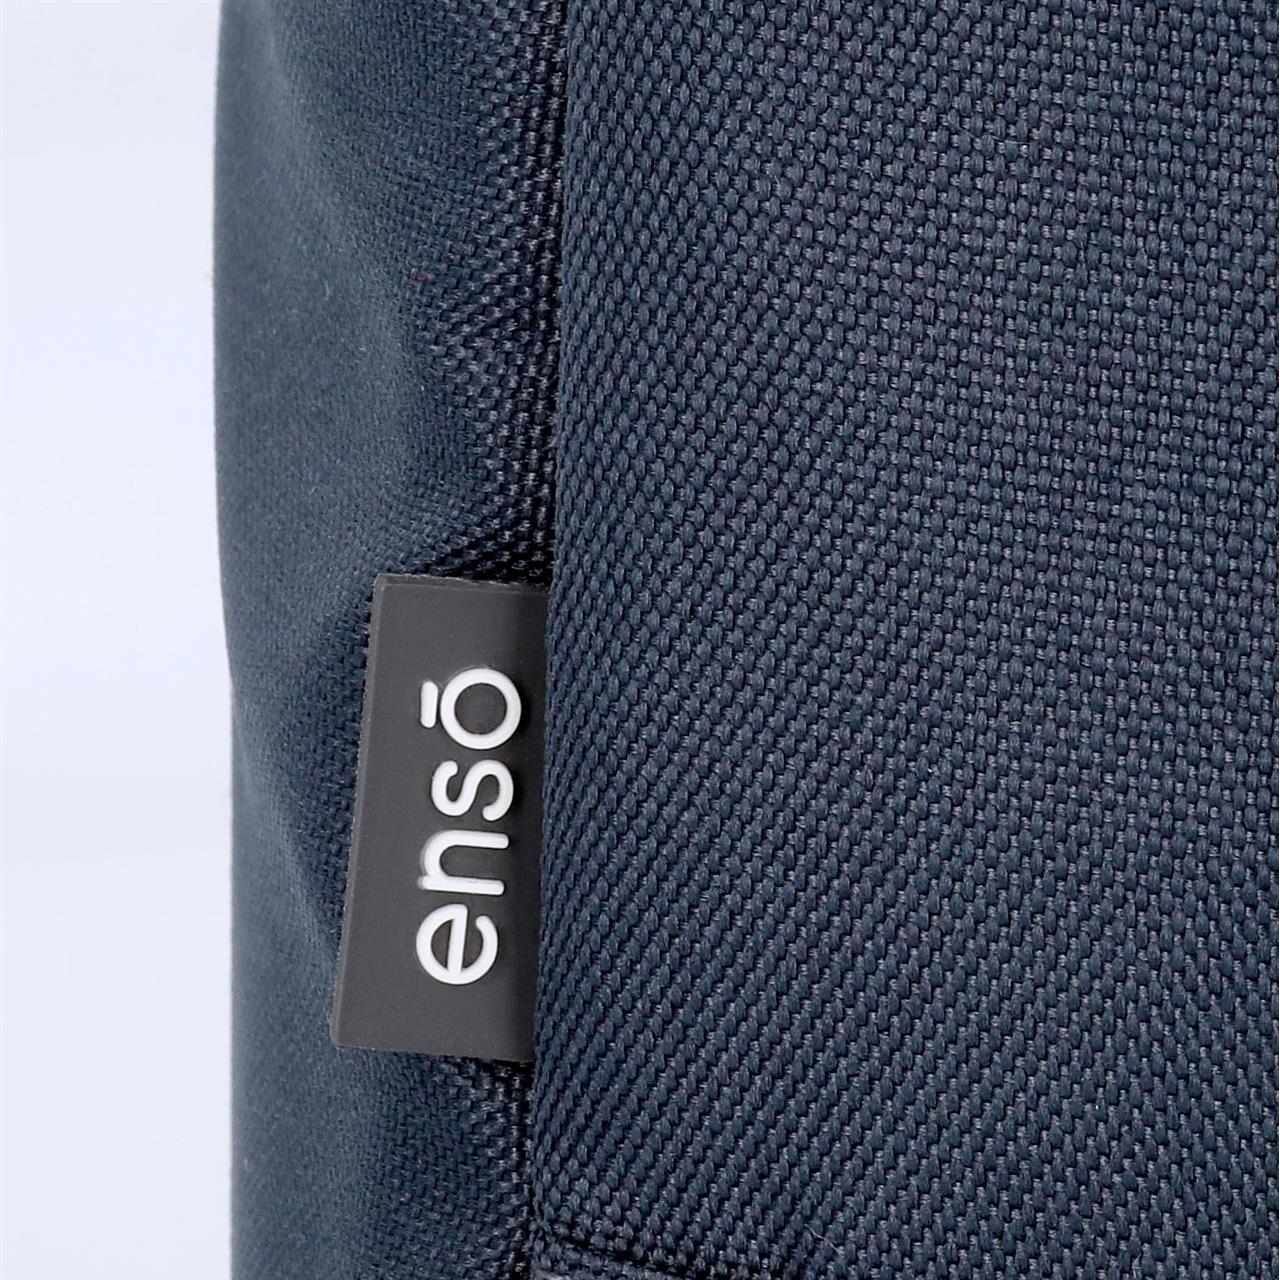 Mochila doble compartimento con carro Enso Basic Azul